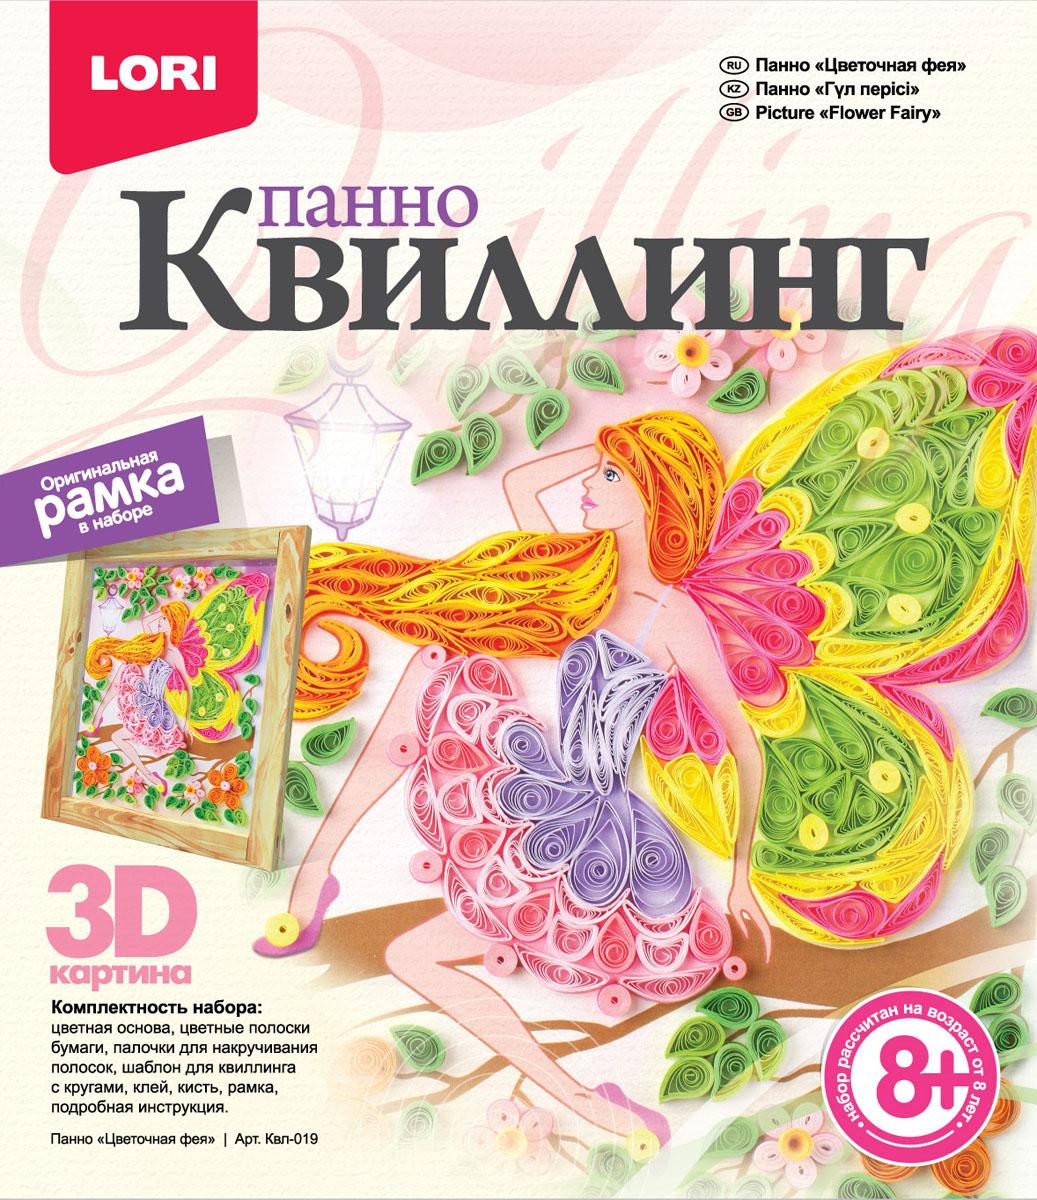 Zakazat.ru Lori Набор для квиллинга Панно Цветочная фея